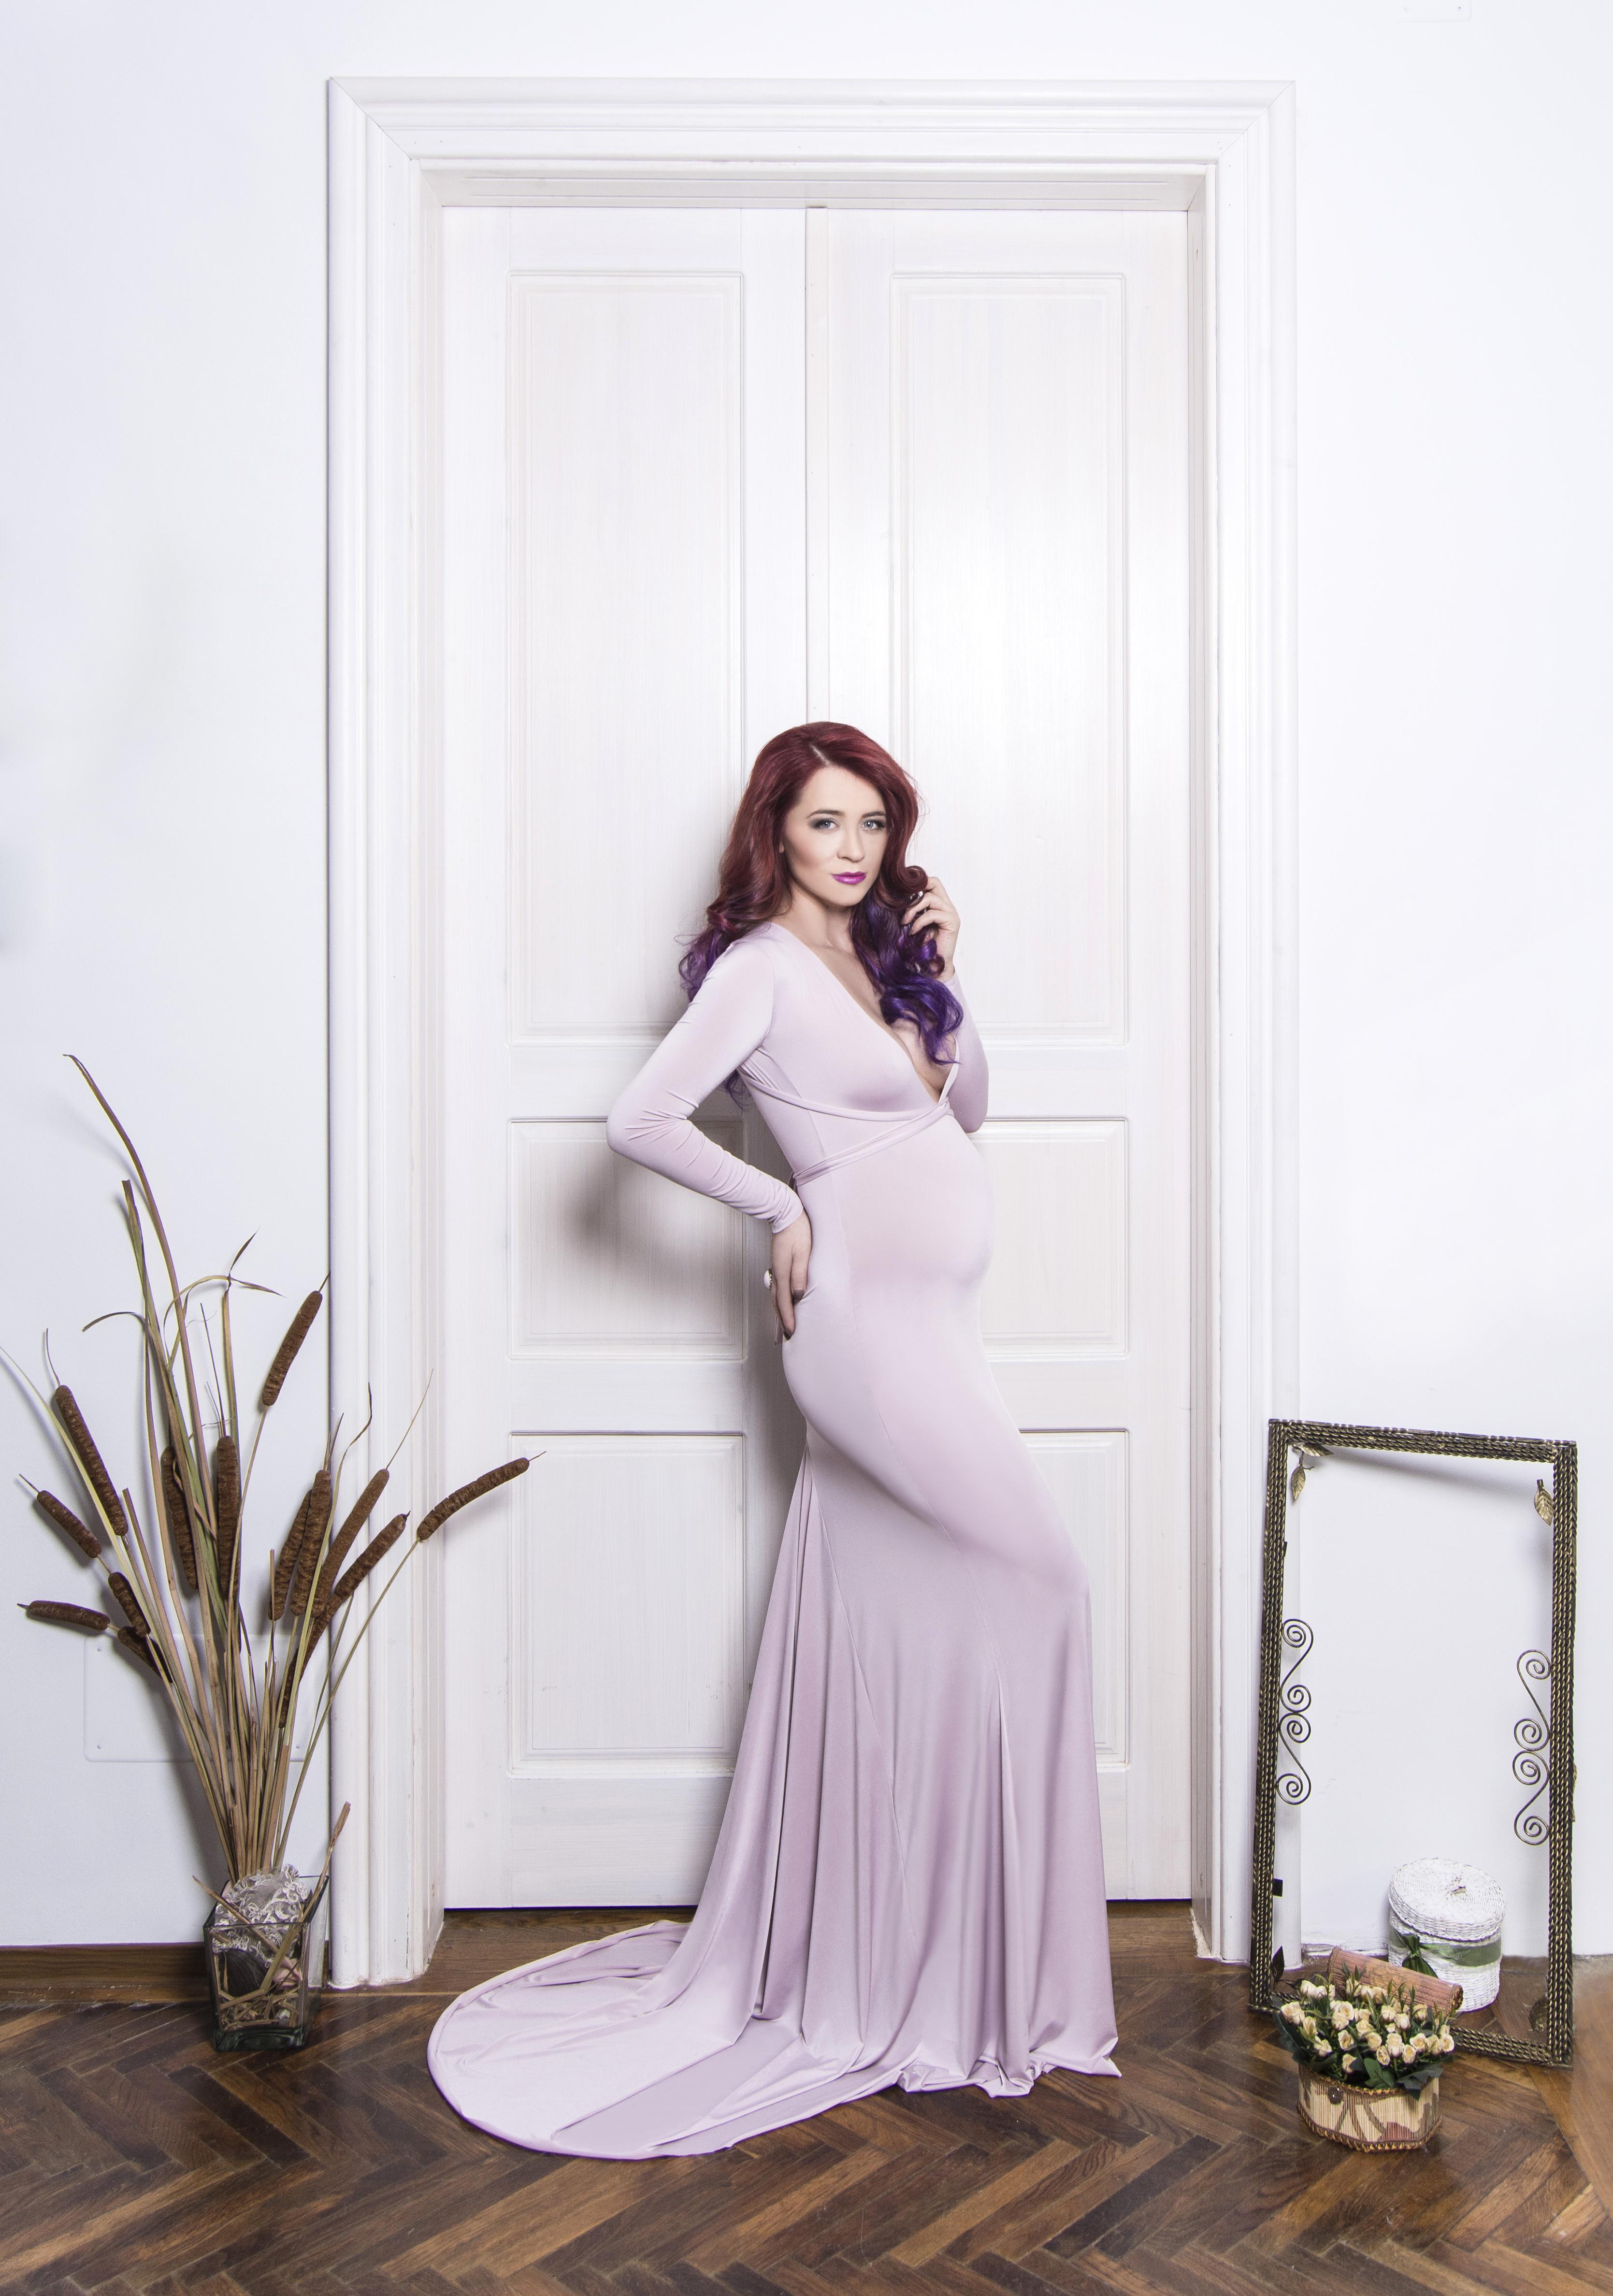 Sarcina Ana Novic DaddyCool